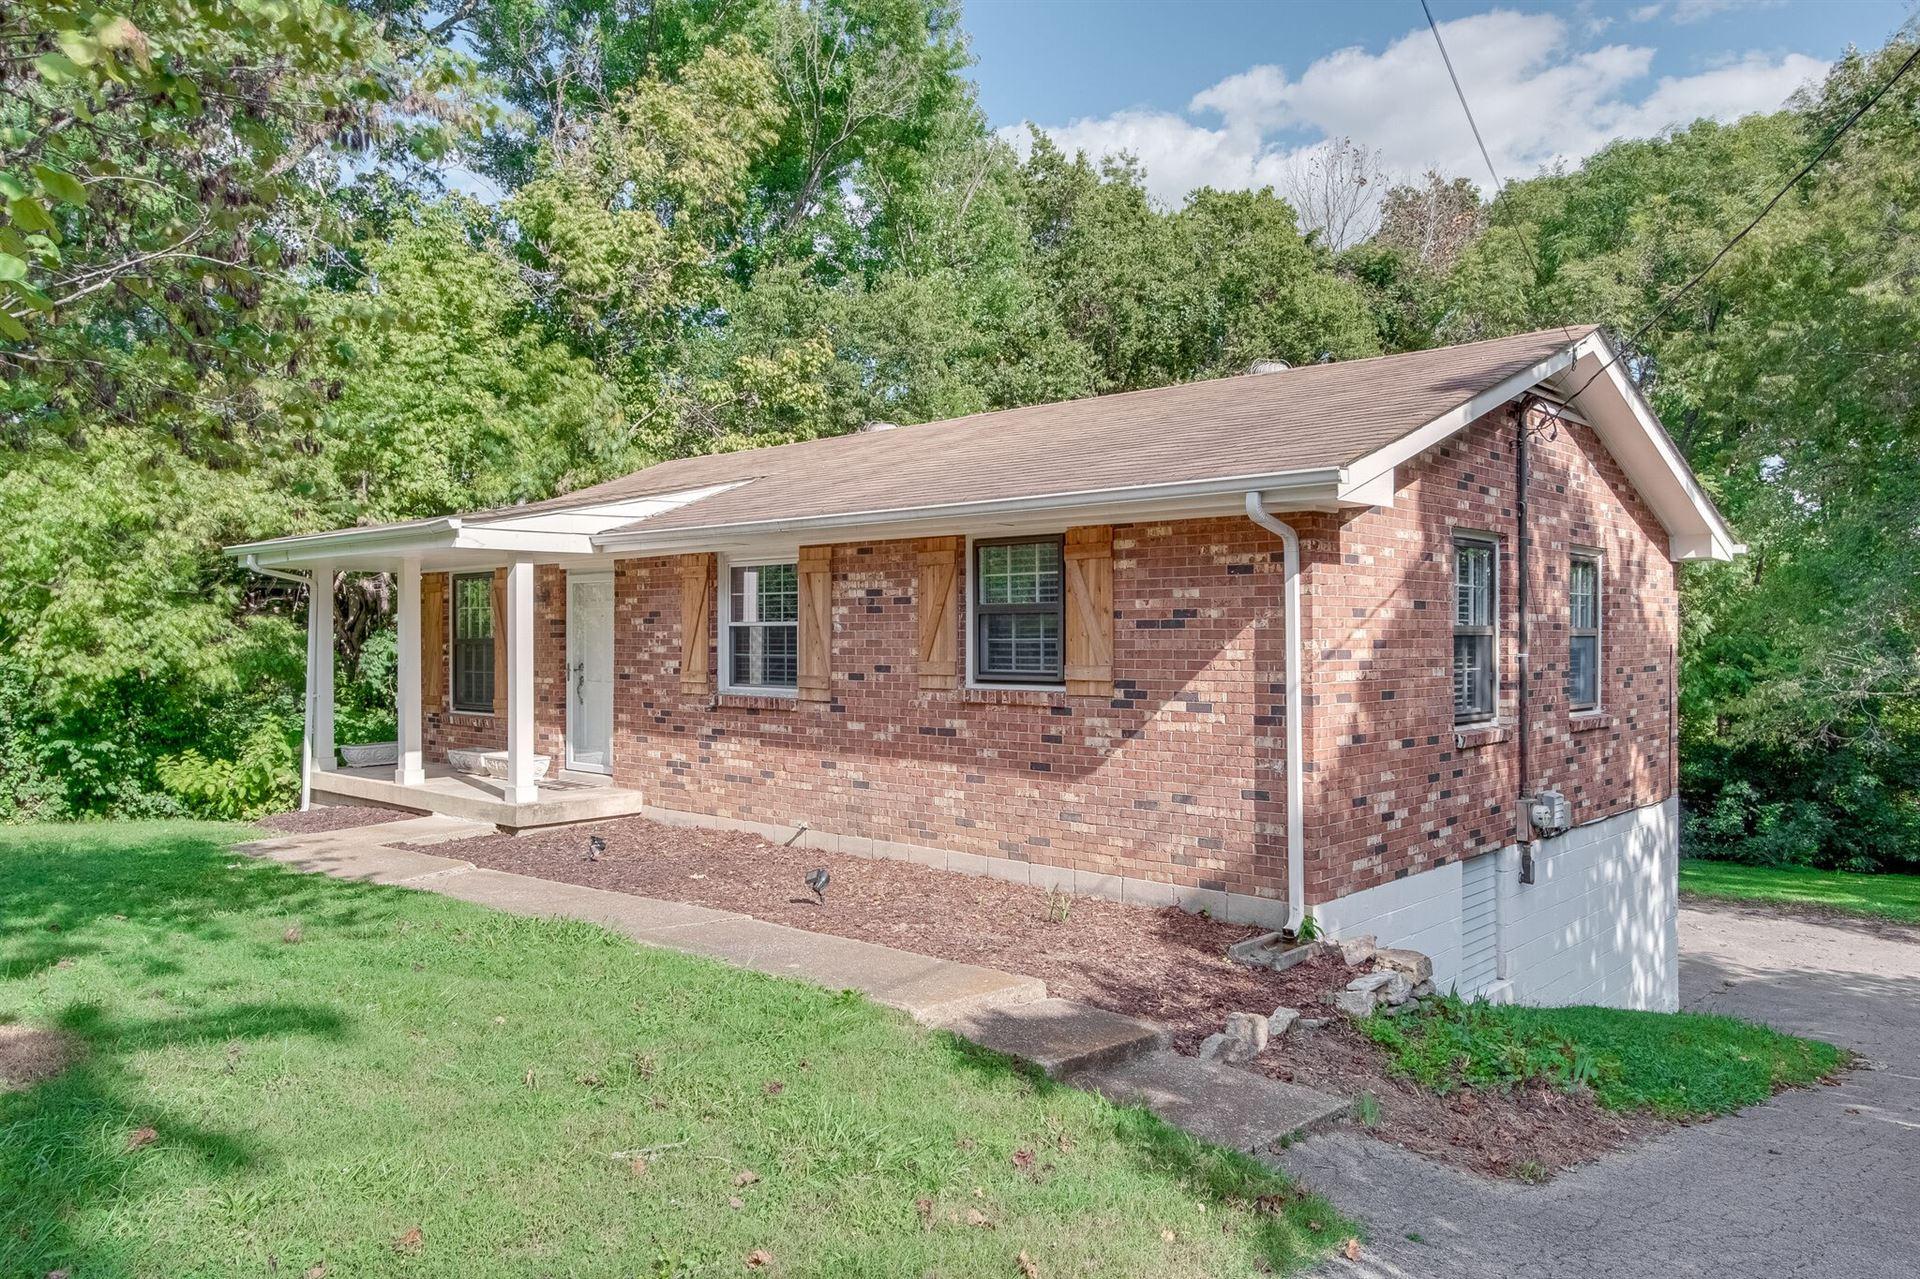 349 Margo Ln, Nashville, TN 37211 - MLS#: 2286245